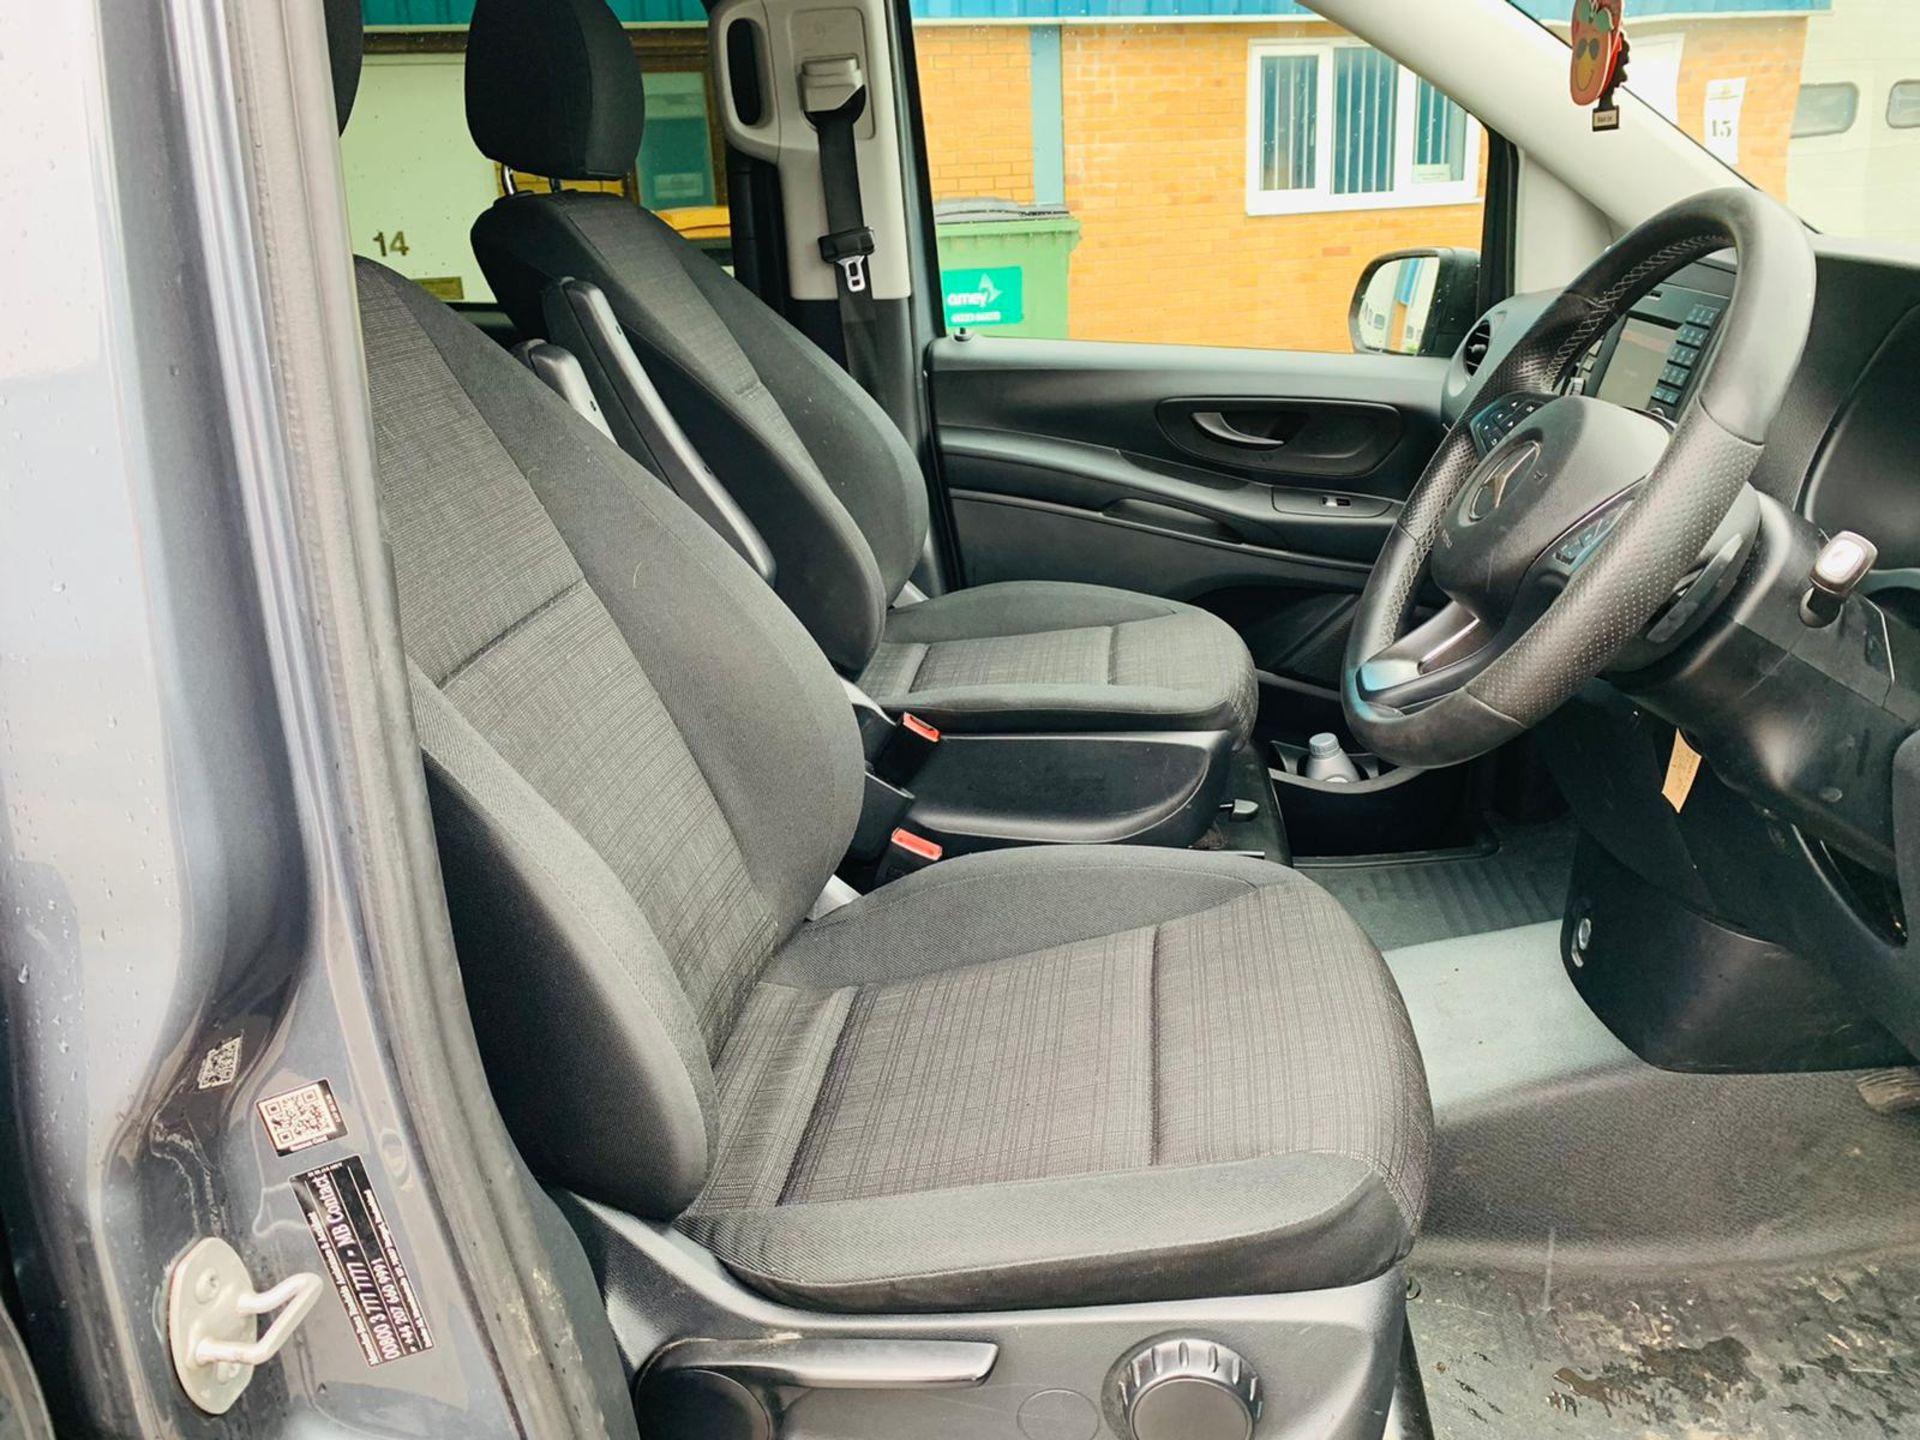 Mercedes Vito 114 Bluetec Dualiner/Crew Van - Auto - Air Con - 2018 18 Reg - 1 Owner From New - Image 13 of 25